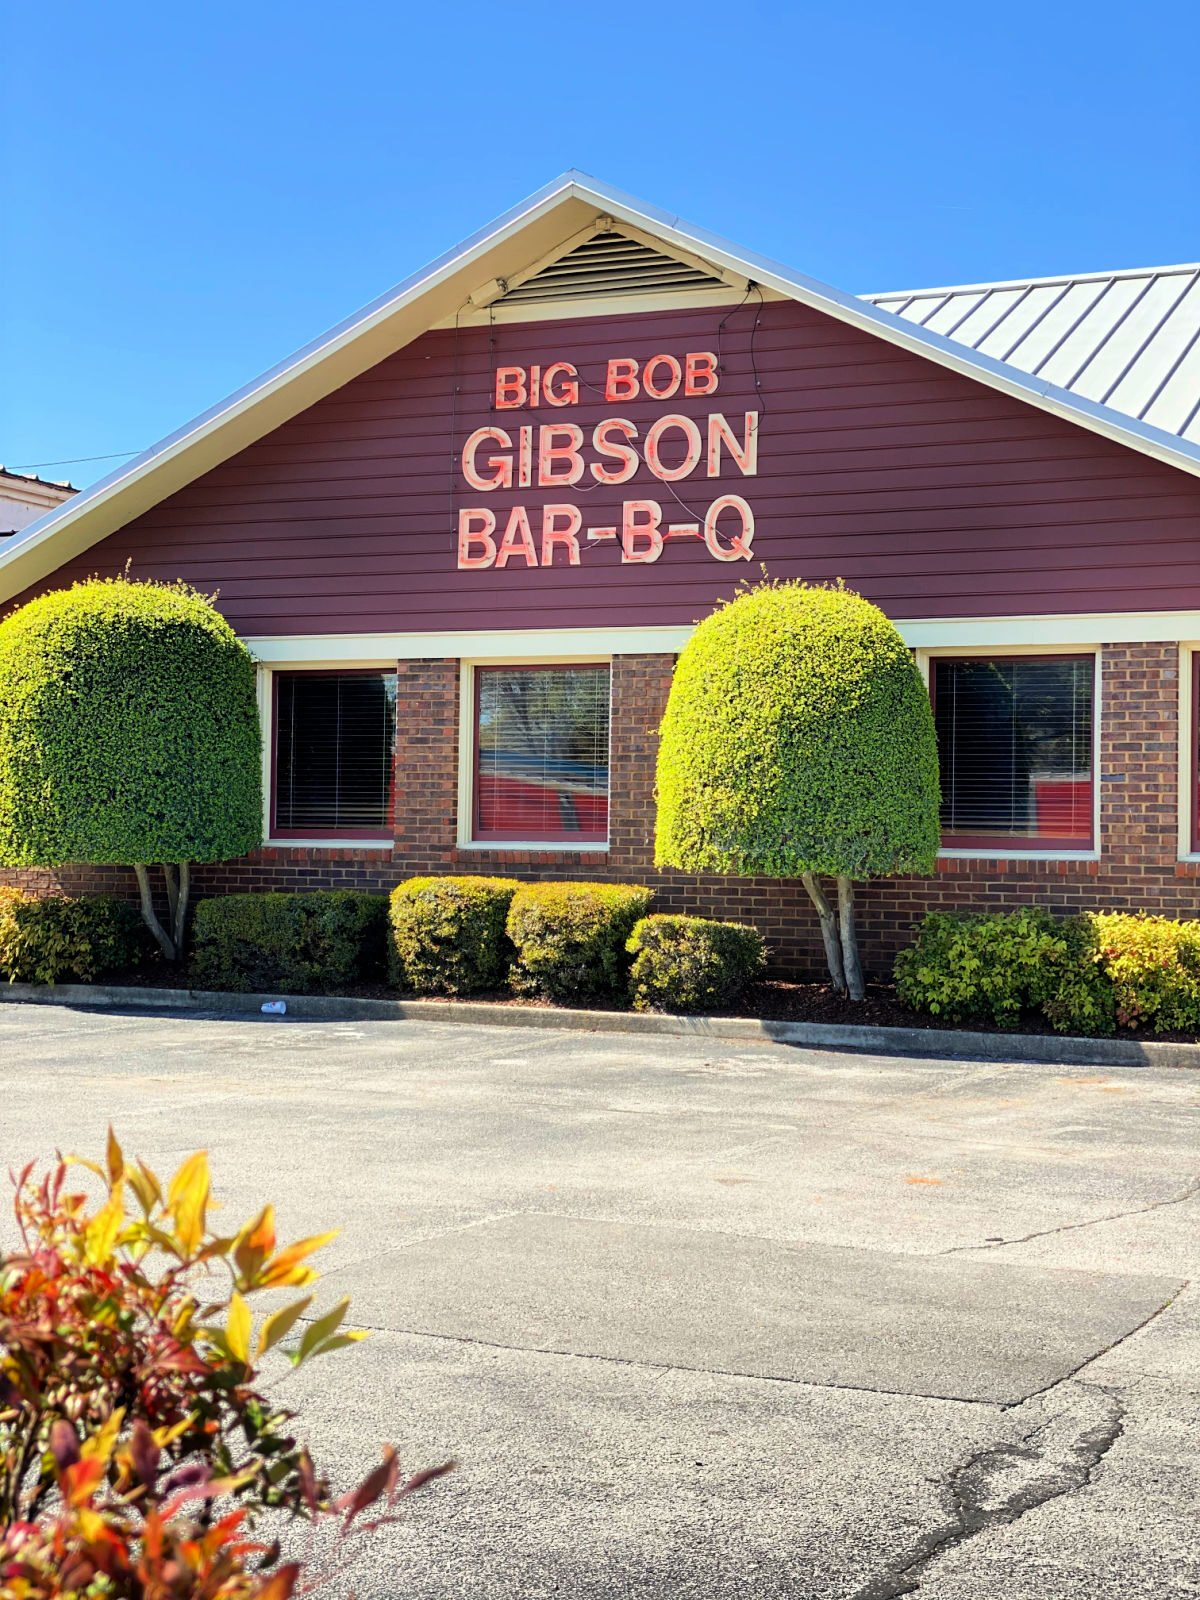 Big Bob Gibson's Restaurant on 6th in Decatur, Alabama.